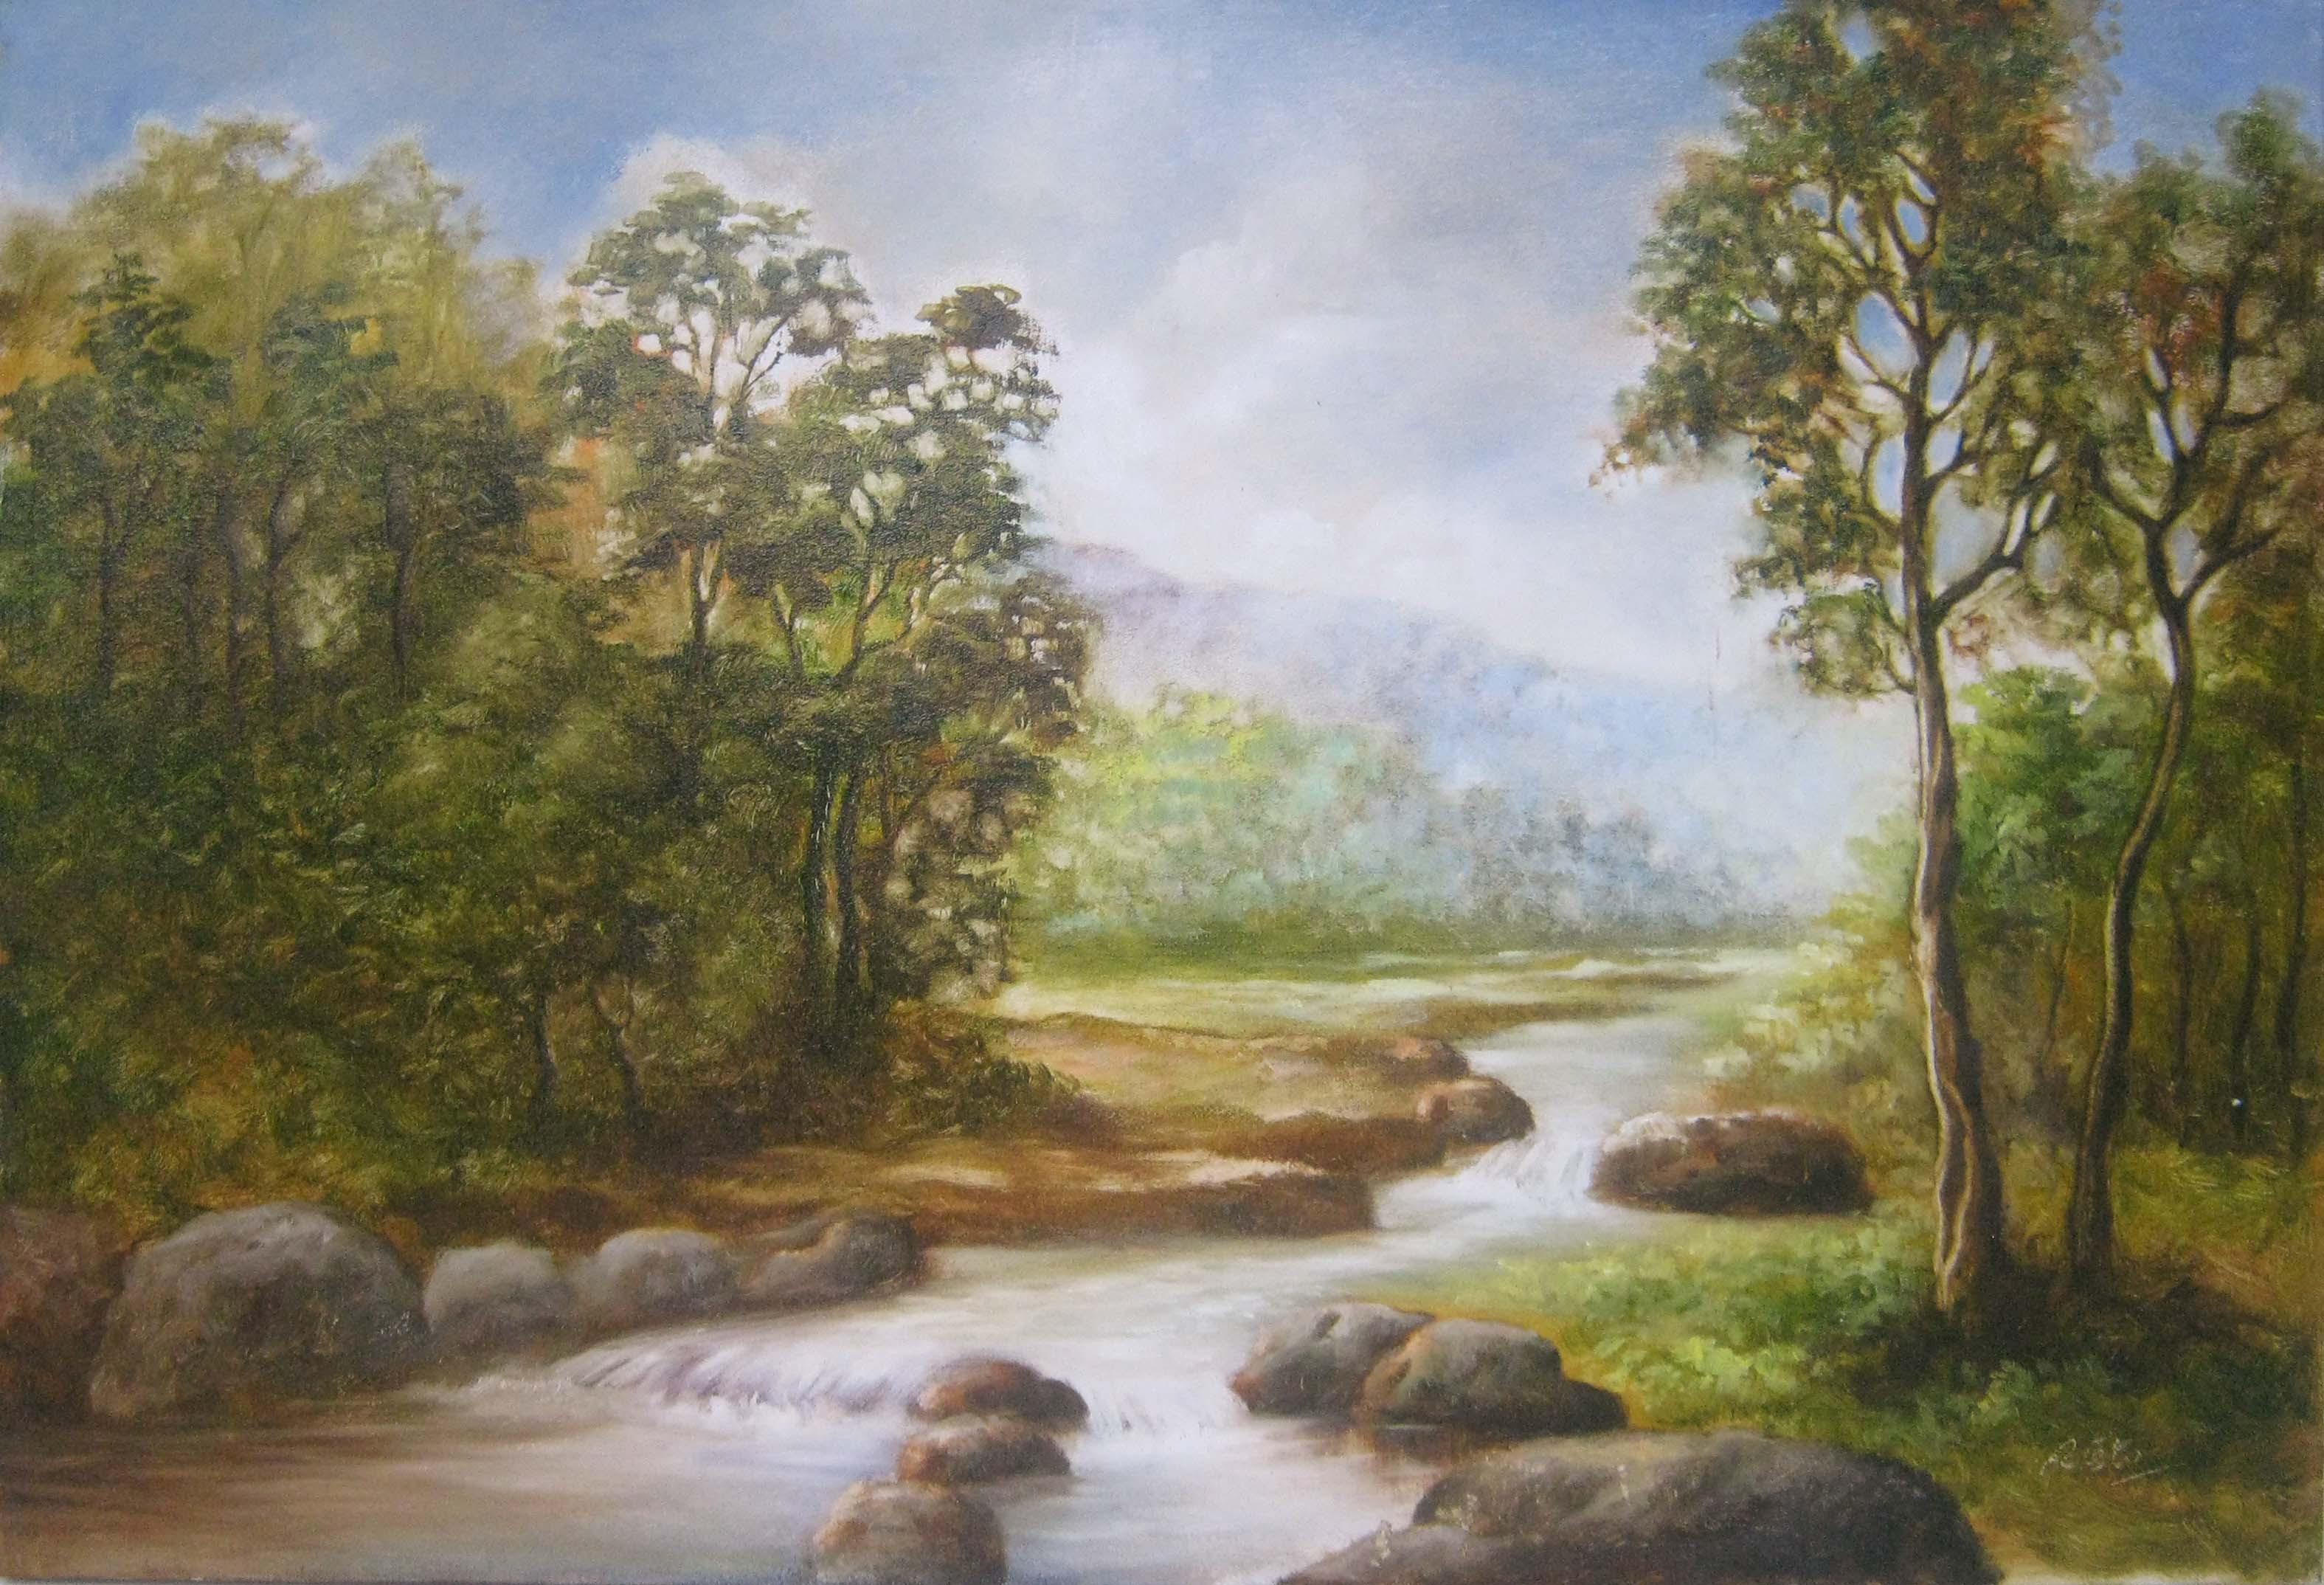 Lukisan Alam Pedesaan 2020 Koleksi Gambar HD